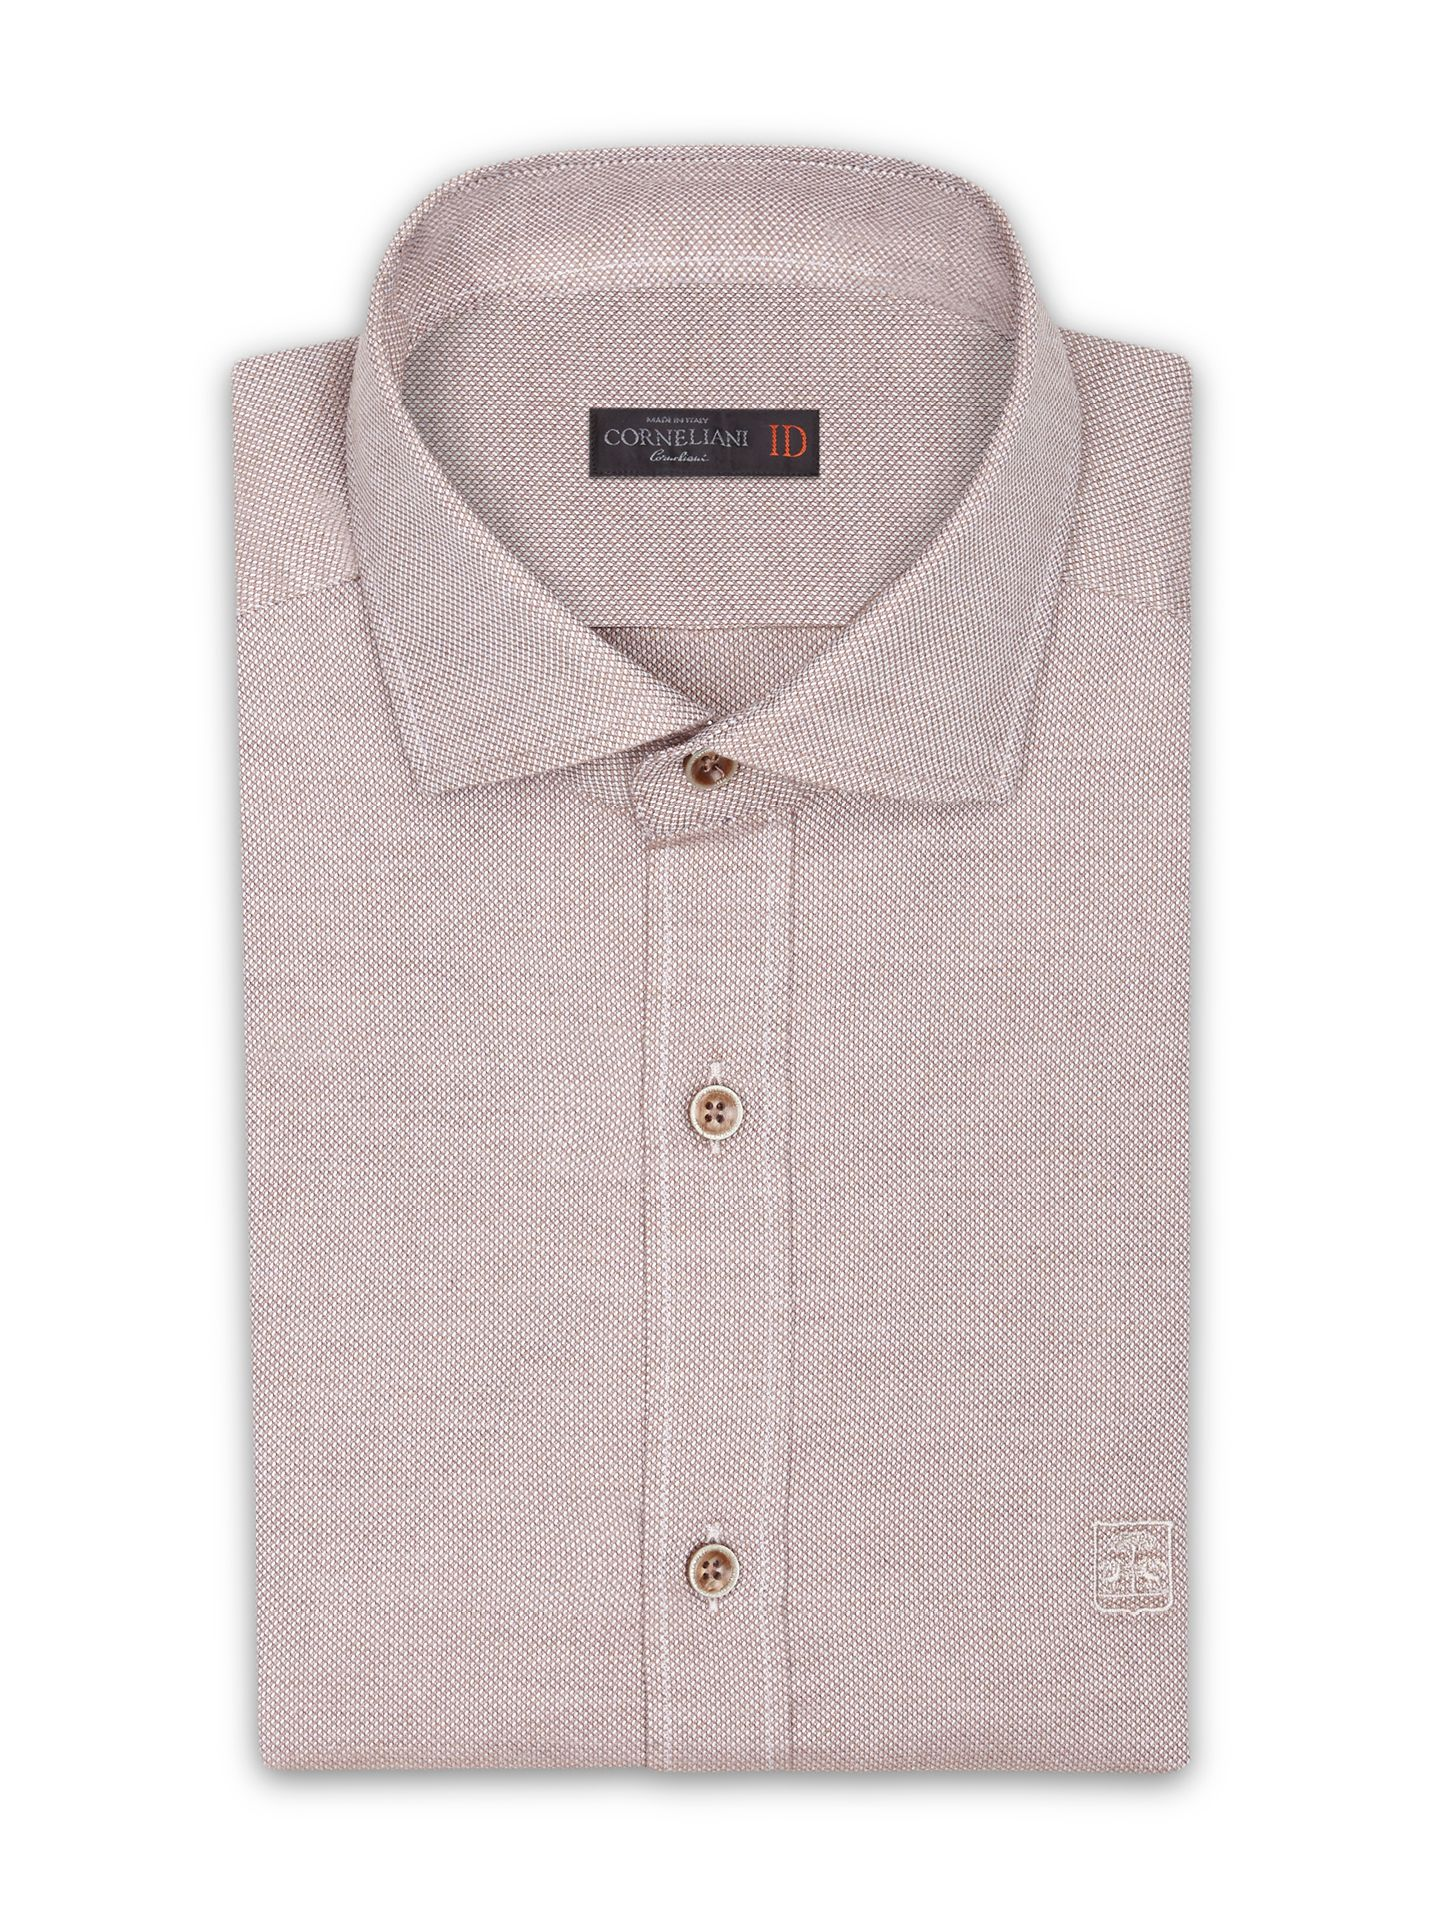 Beige Royal Oxford cotton #shirt, small collar. #Corneliani #FW16 #accessories